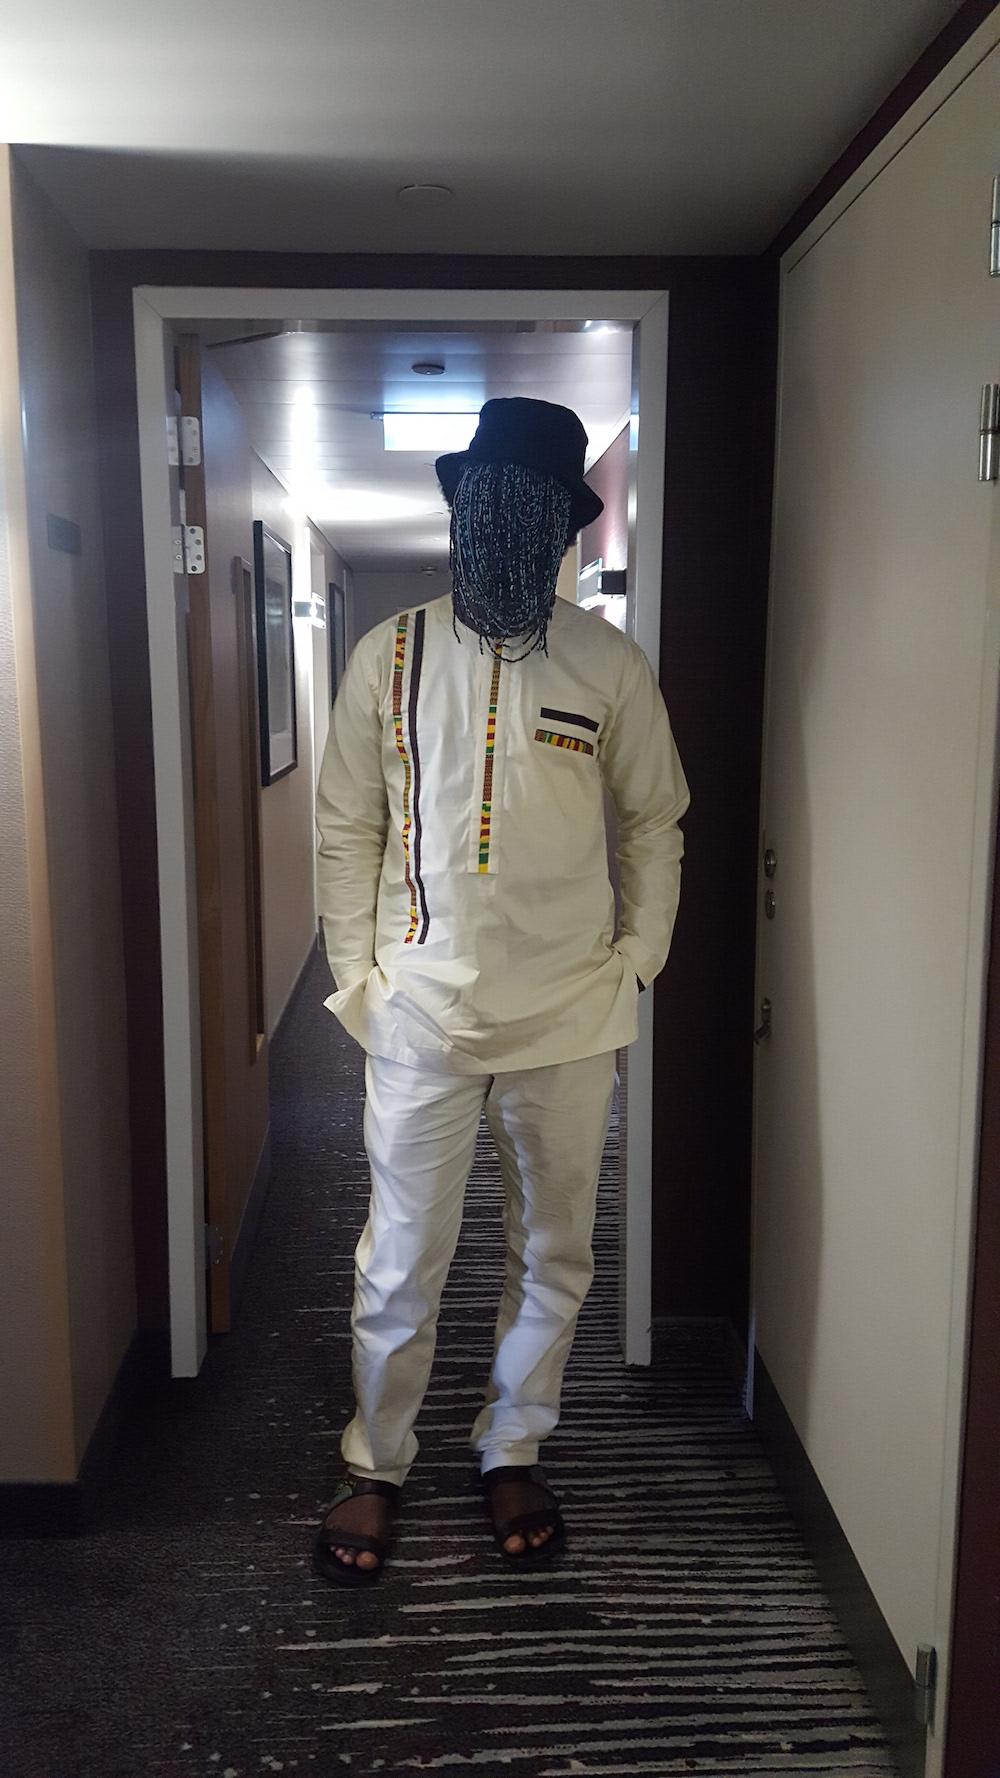 Meet Anas Aremeyaw Anas. Ghana's masked journalist